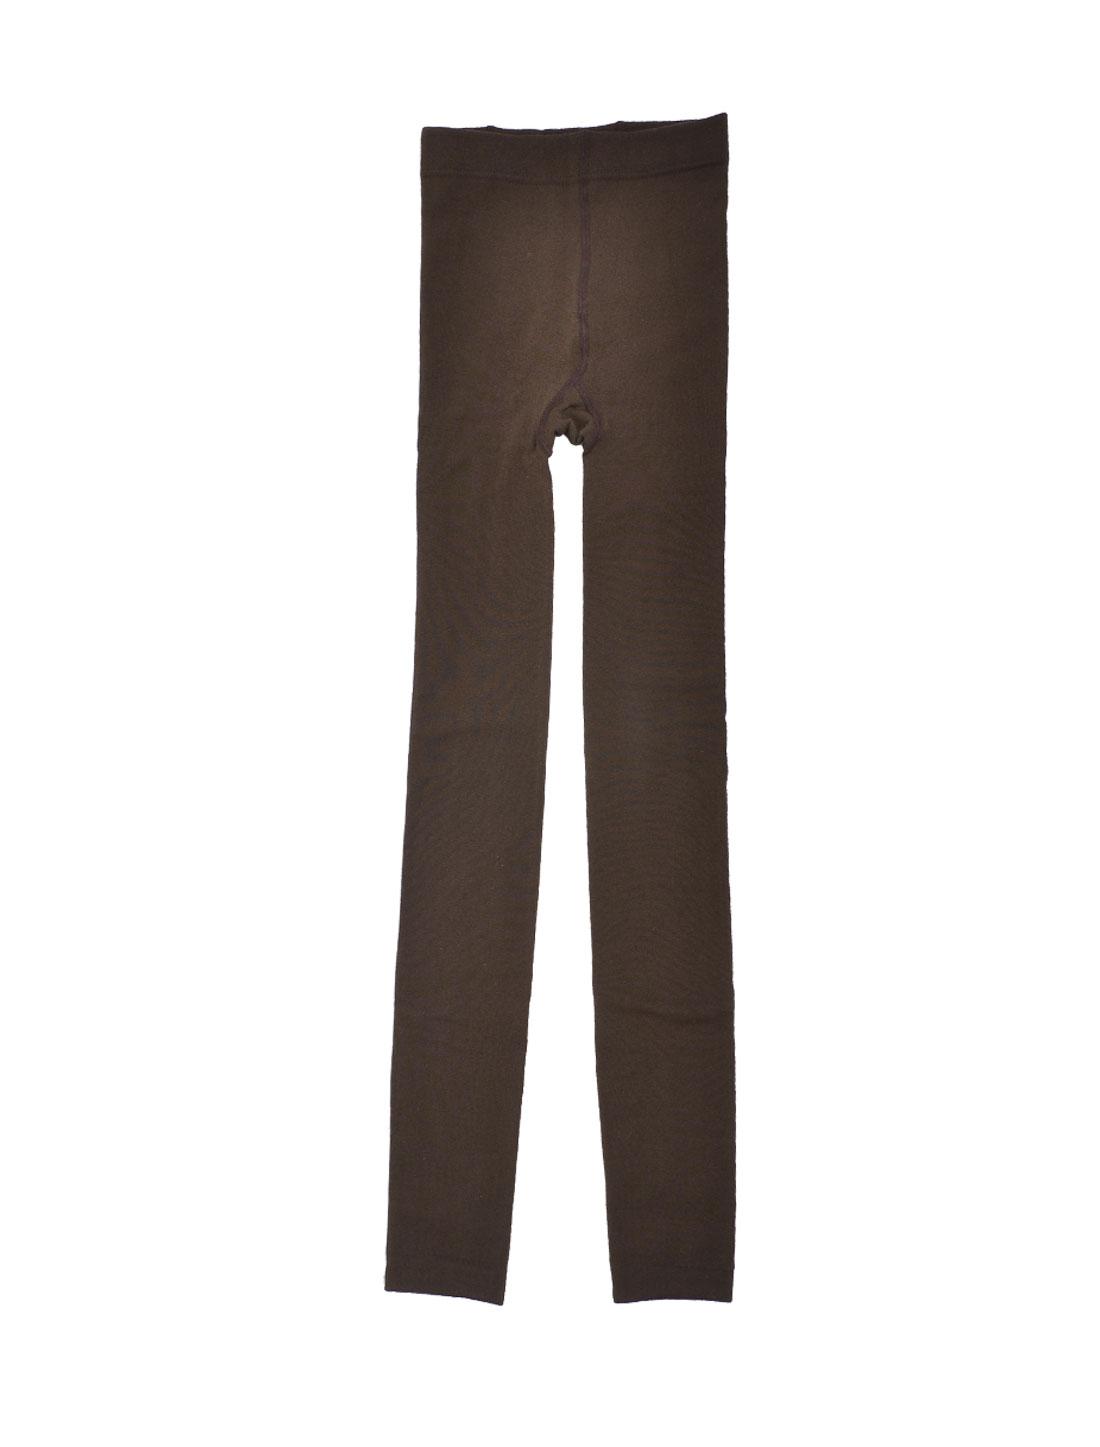 Winter Brown Stretch Fleece Lined Tights Nine Pants Leggings XS